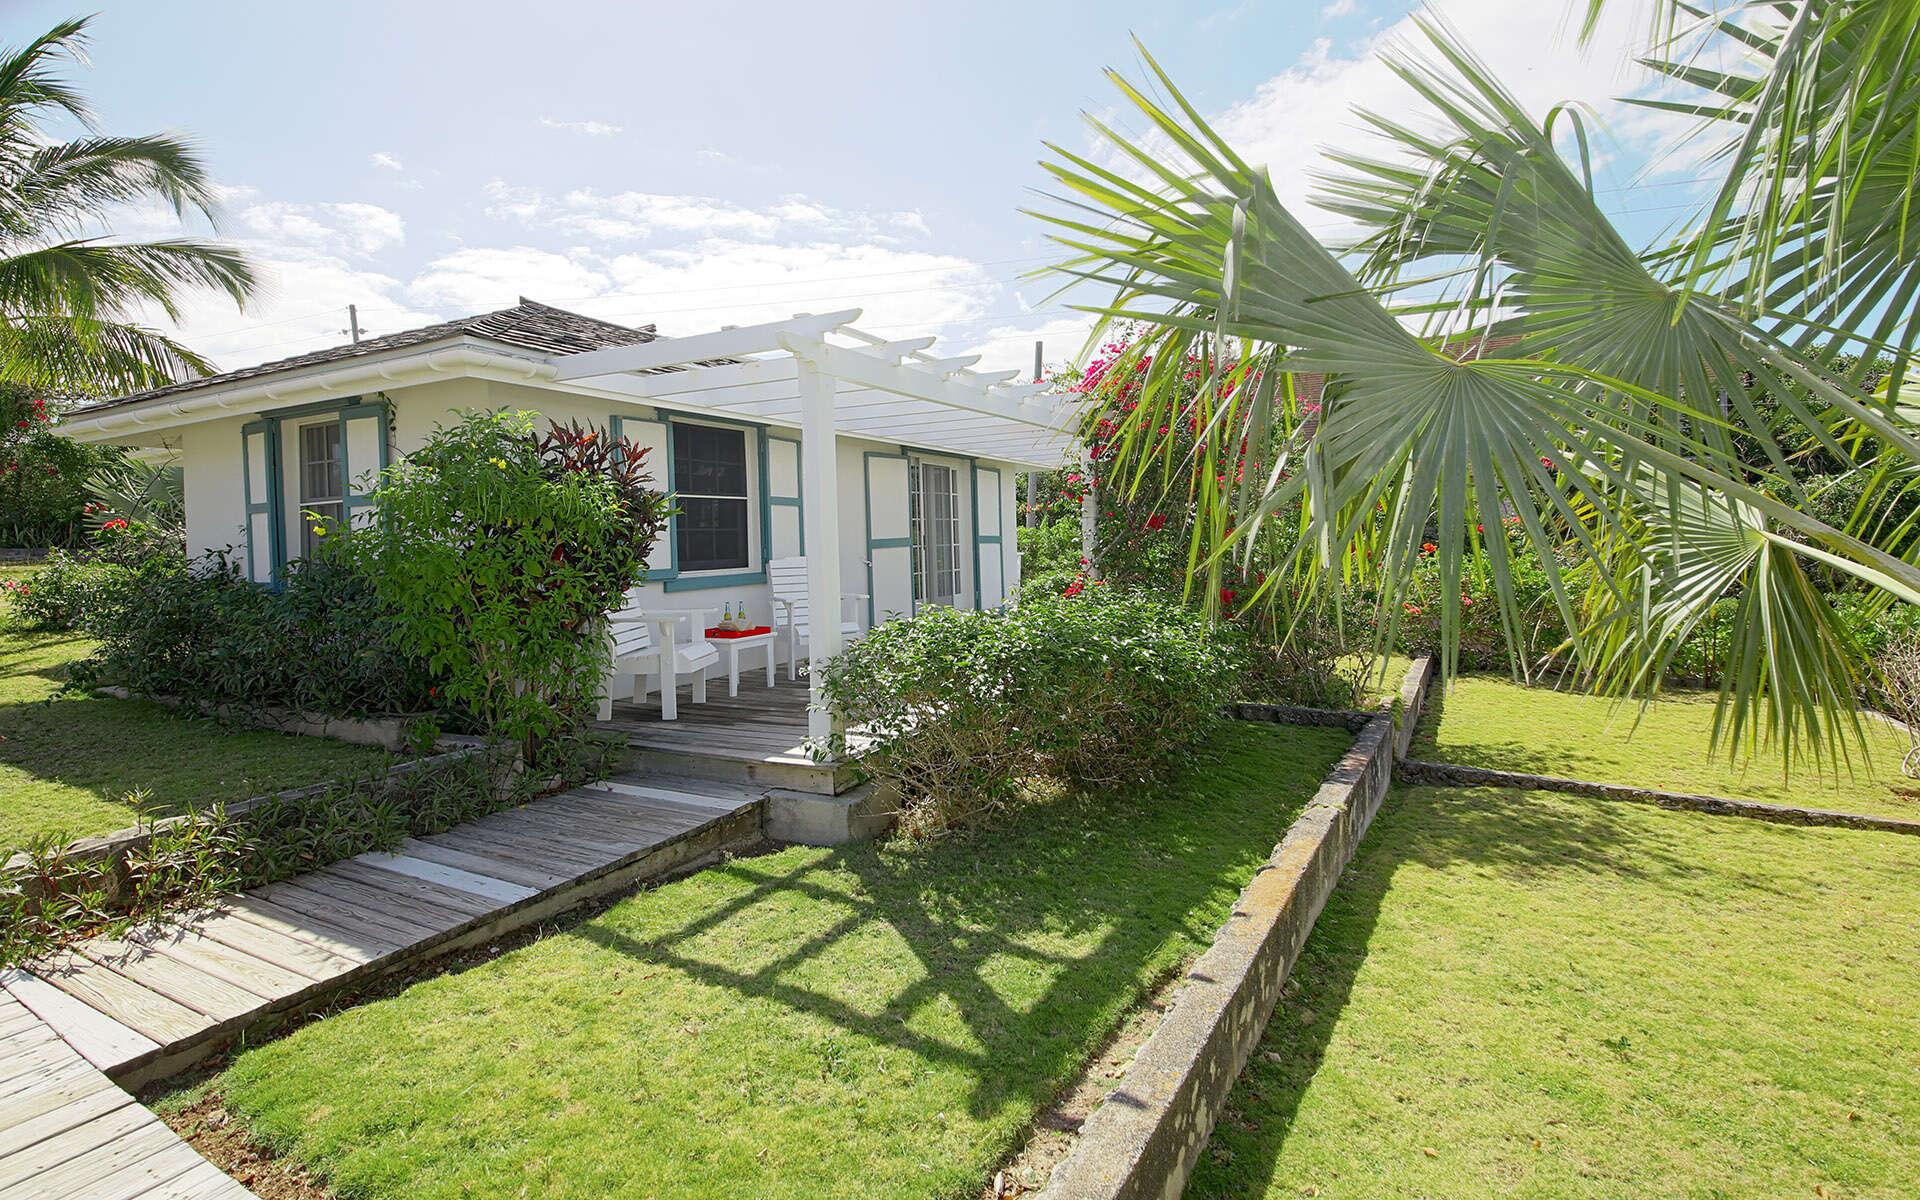 Luxury villa rentals caribbean - Bahamas - Eleuthera - Governors harbour - Belmont Cottage - Image 1/7